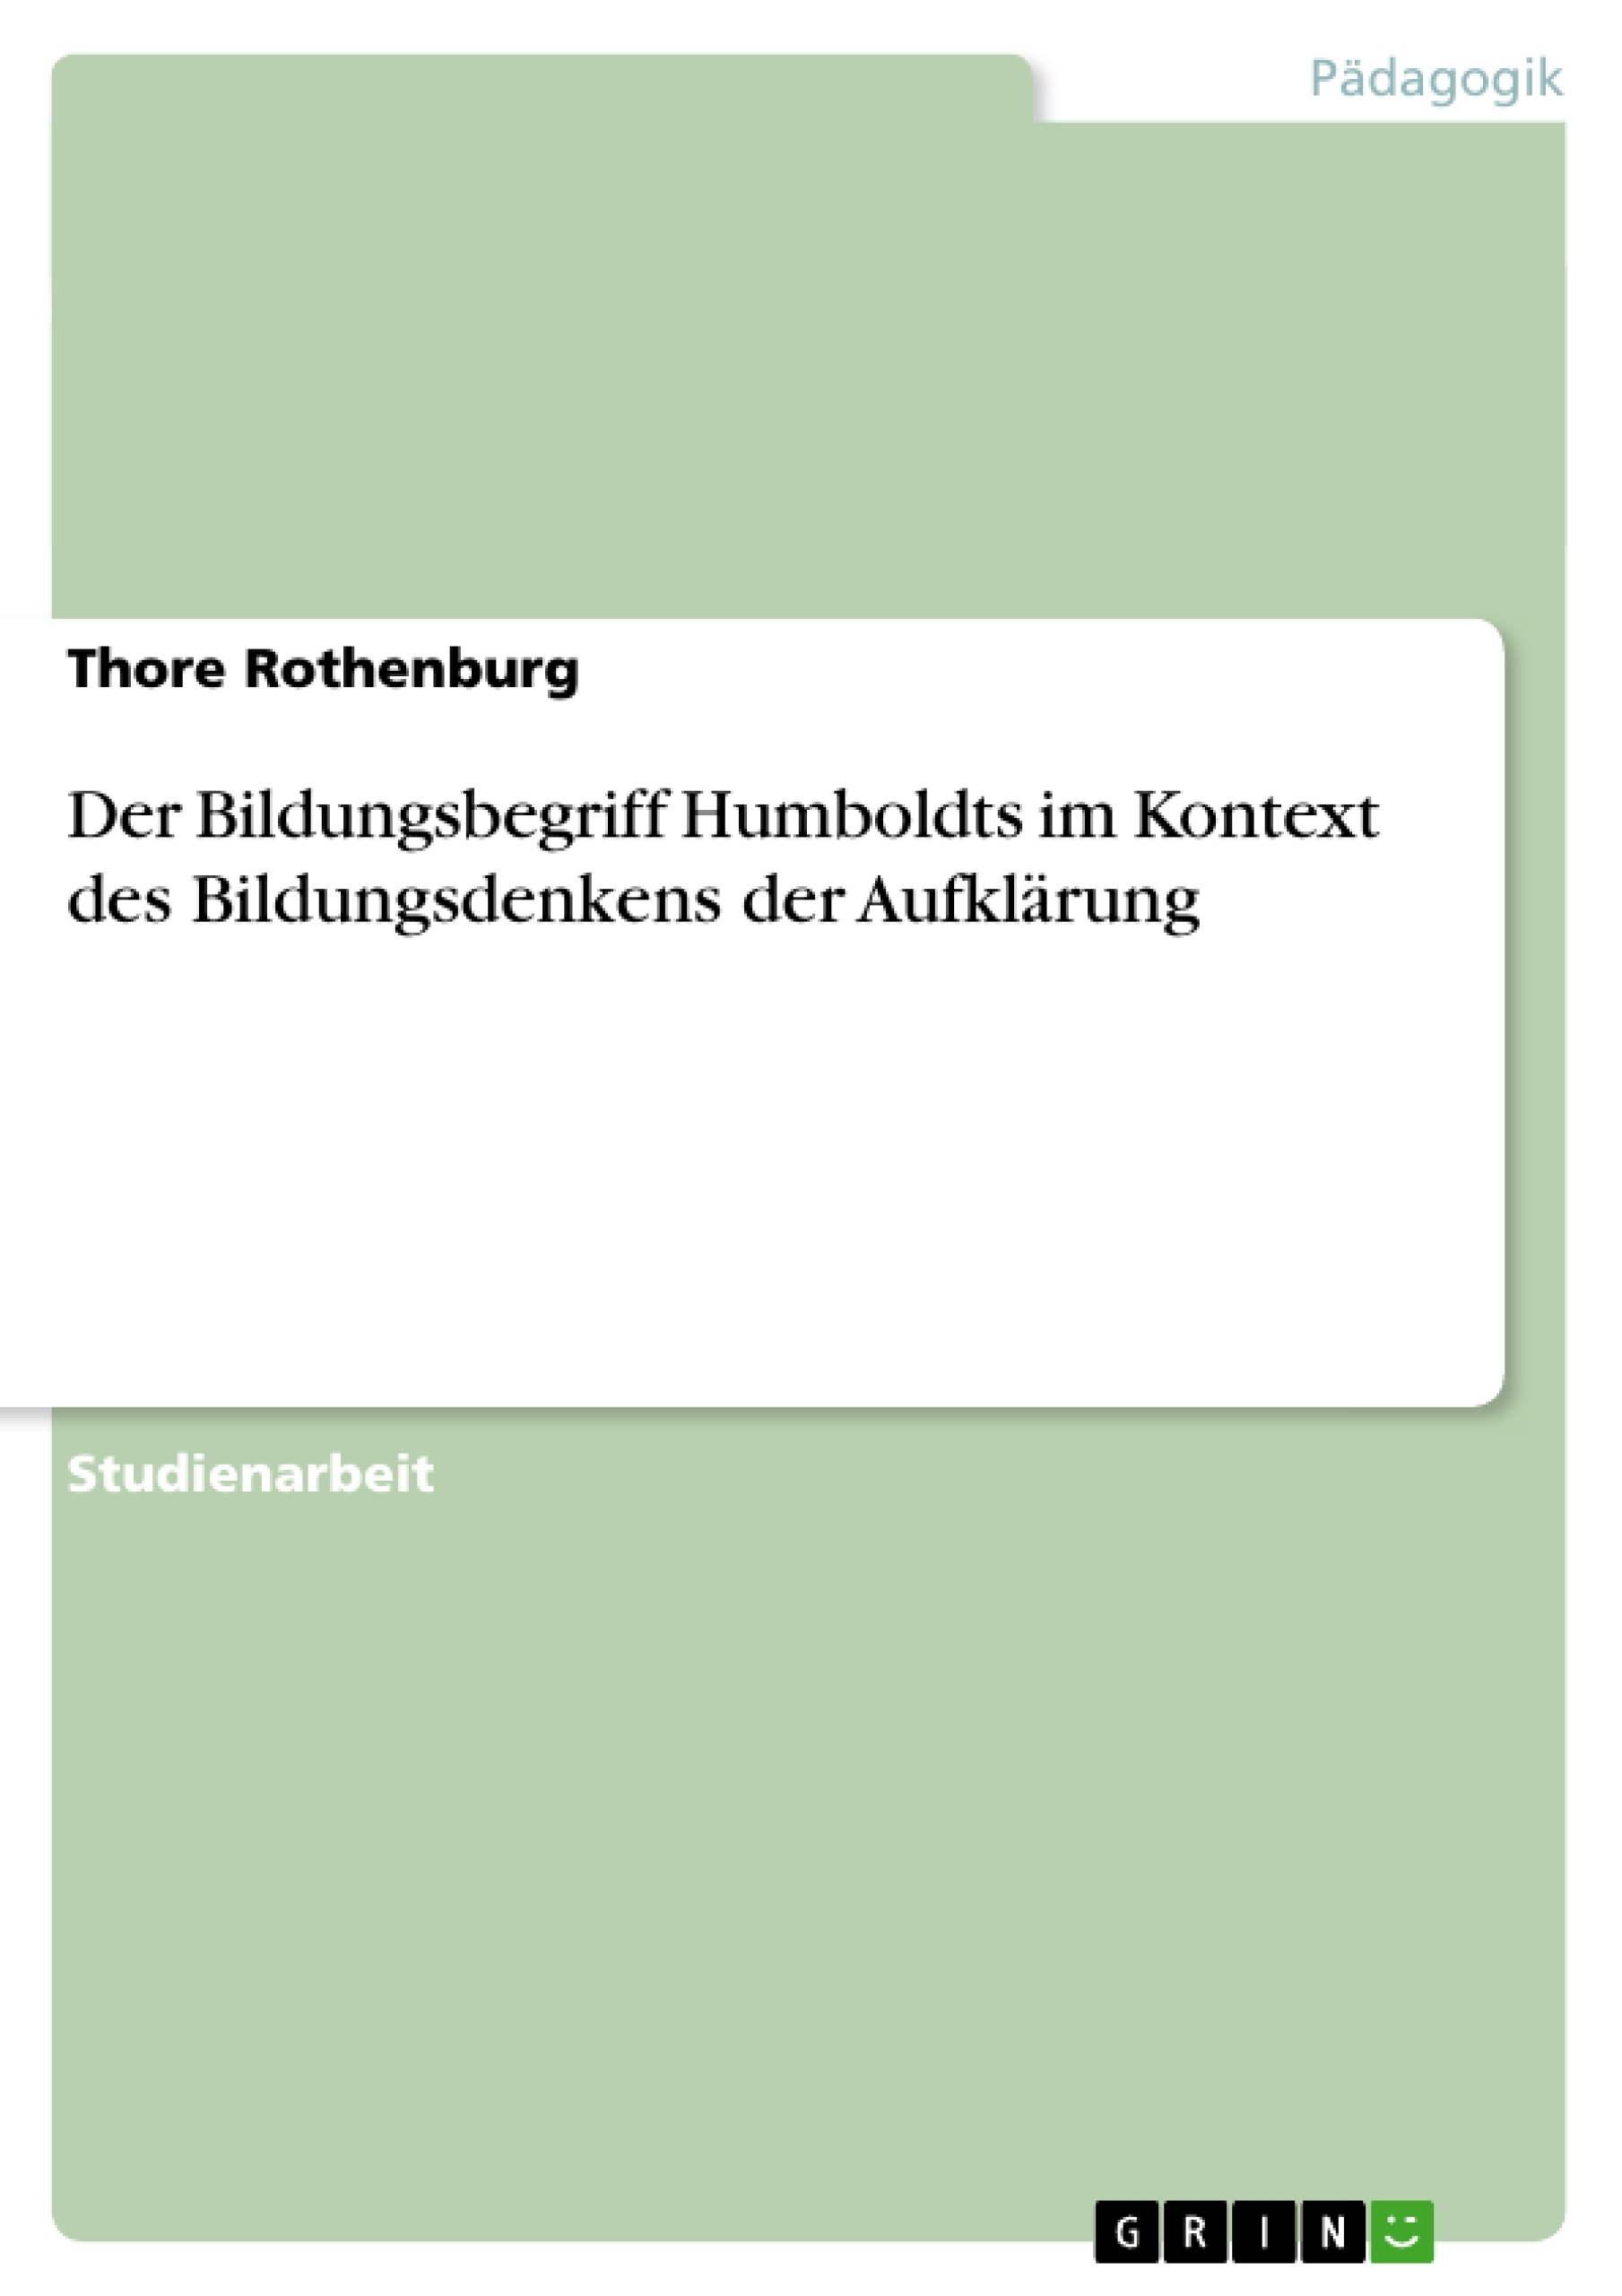 Humboldts Bildungsbegriff